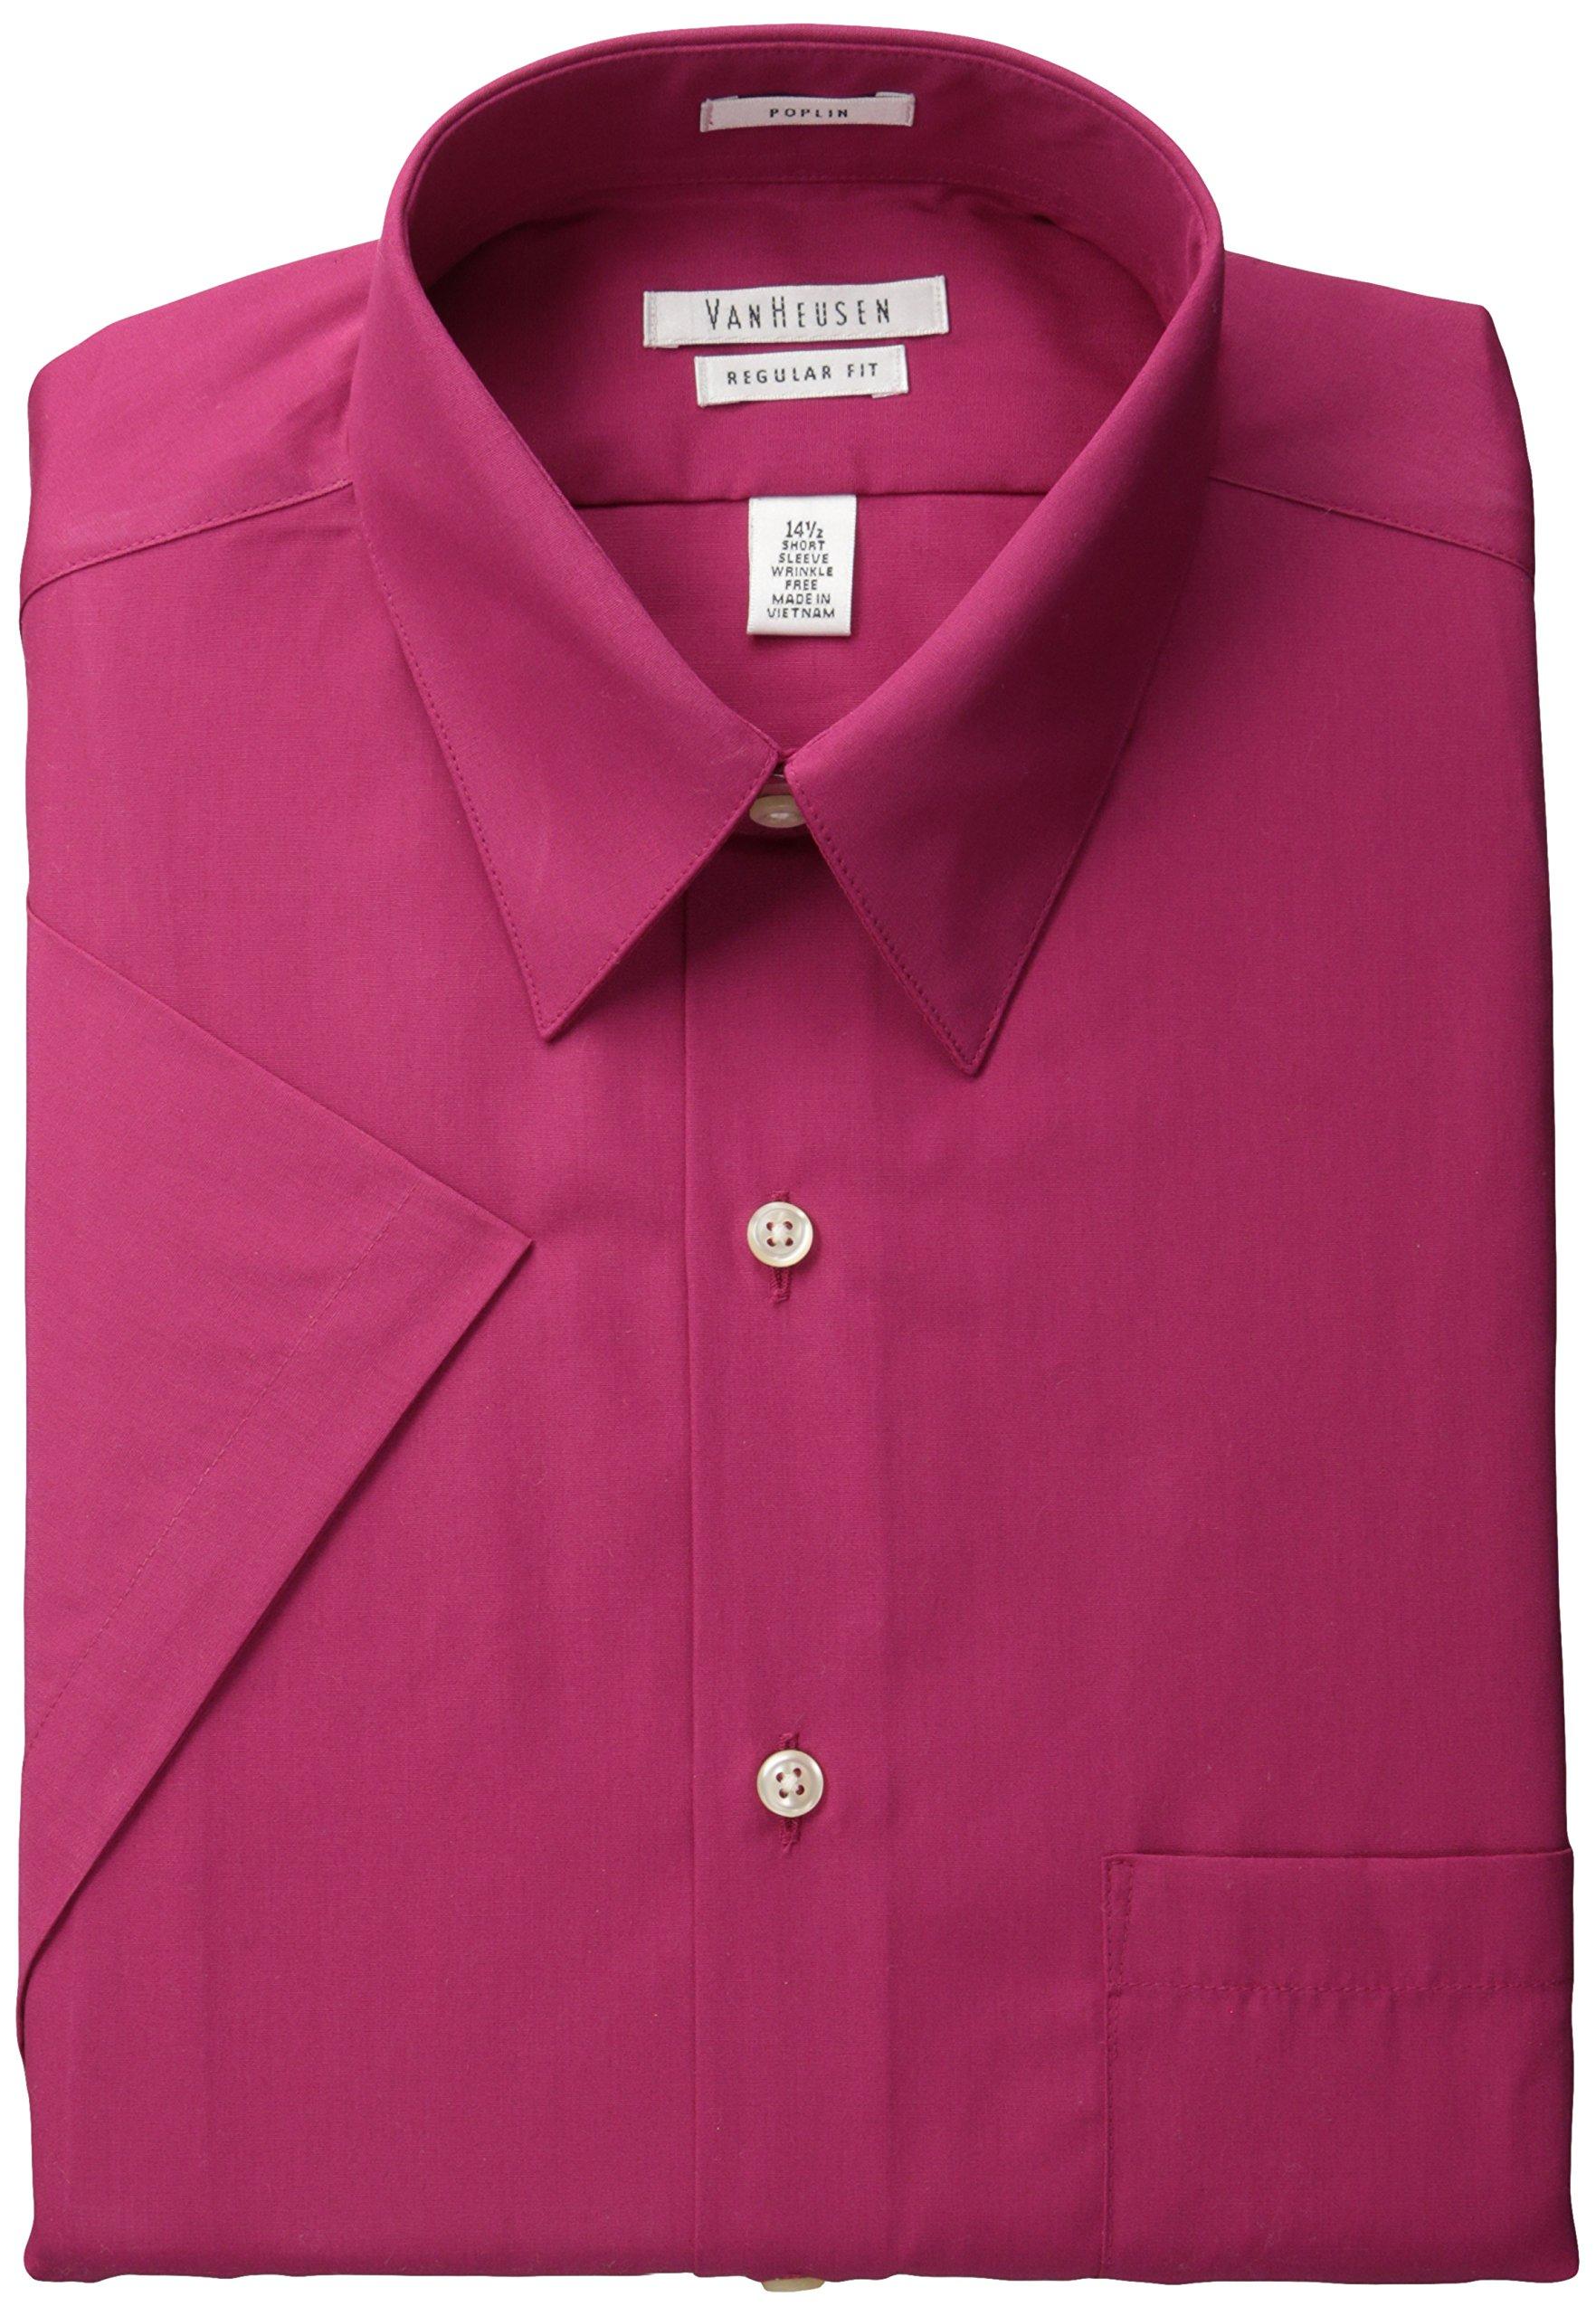 Van Heusen Men's Short Sleeve Poplin Solid Point Collar Dress Shirt, Magenta, 18'' Neck